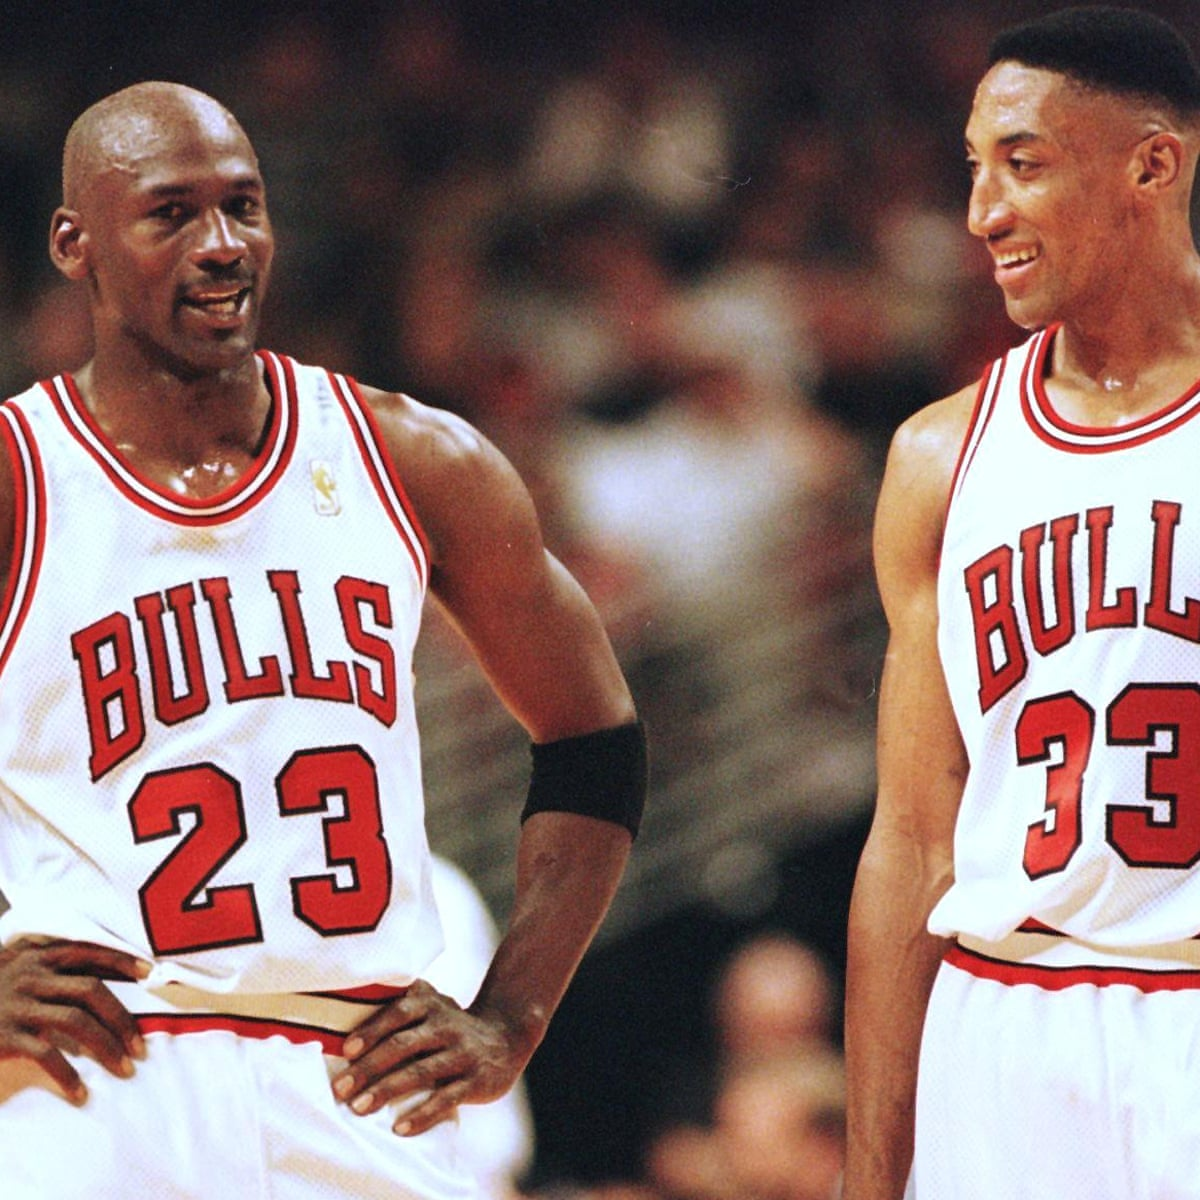 soltar Dato Subir  Michael Jordan says he would have returned to play for Chicago Bulls |  Michael Jordan | The Guardian